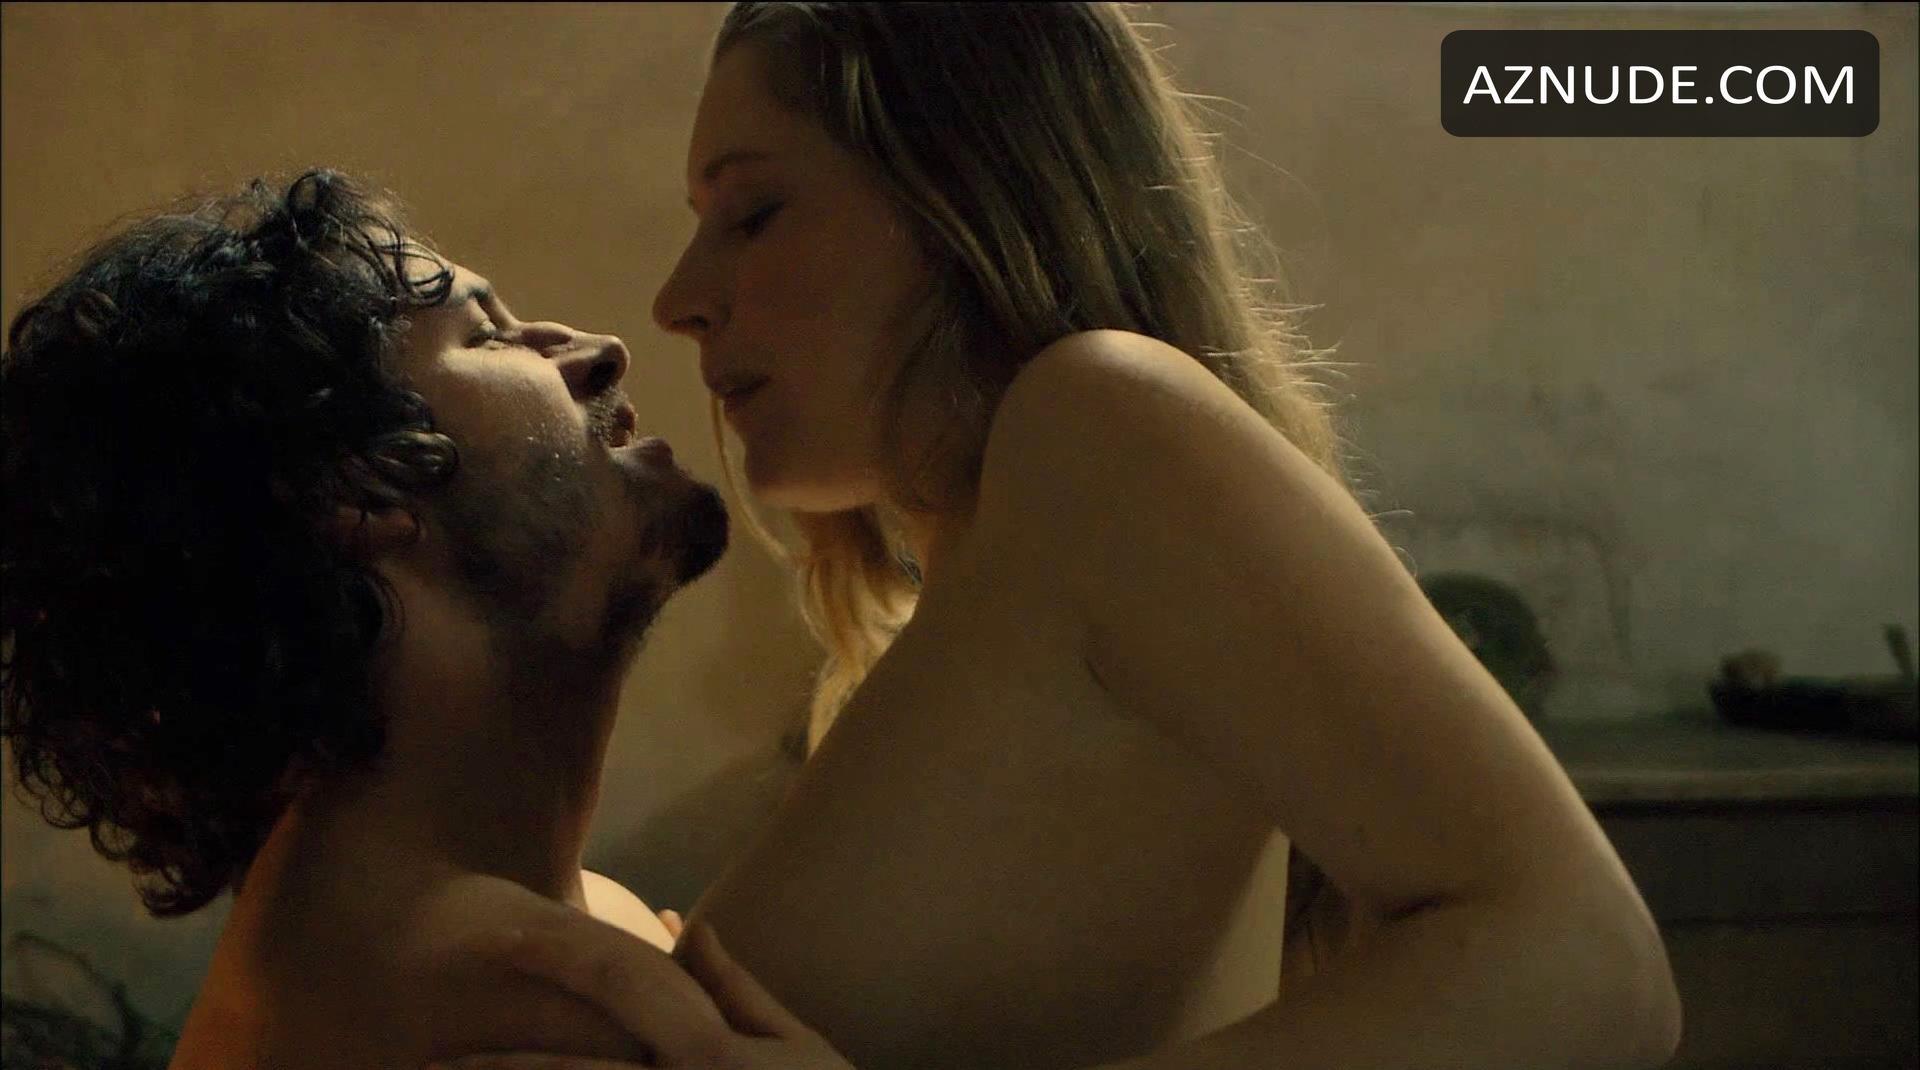 Noomi Rapace Nude Scene In Daisy Diamond Movie